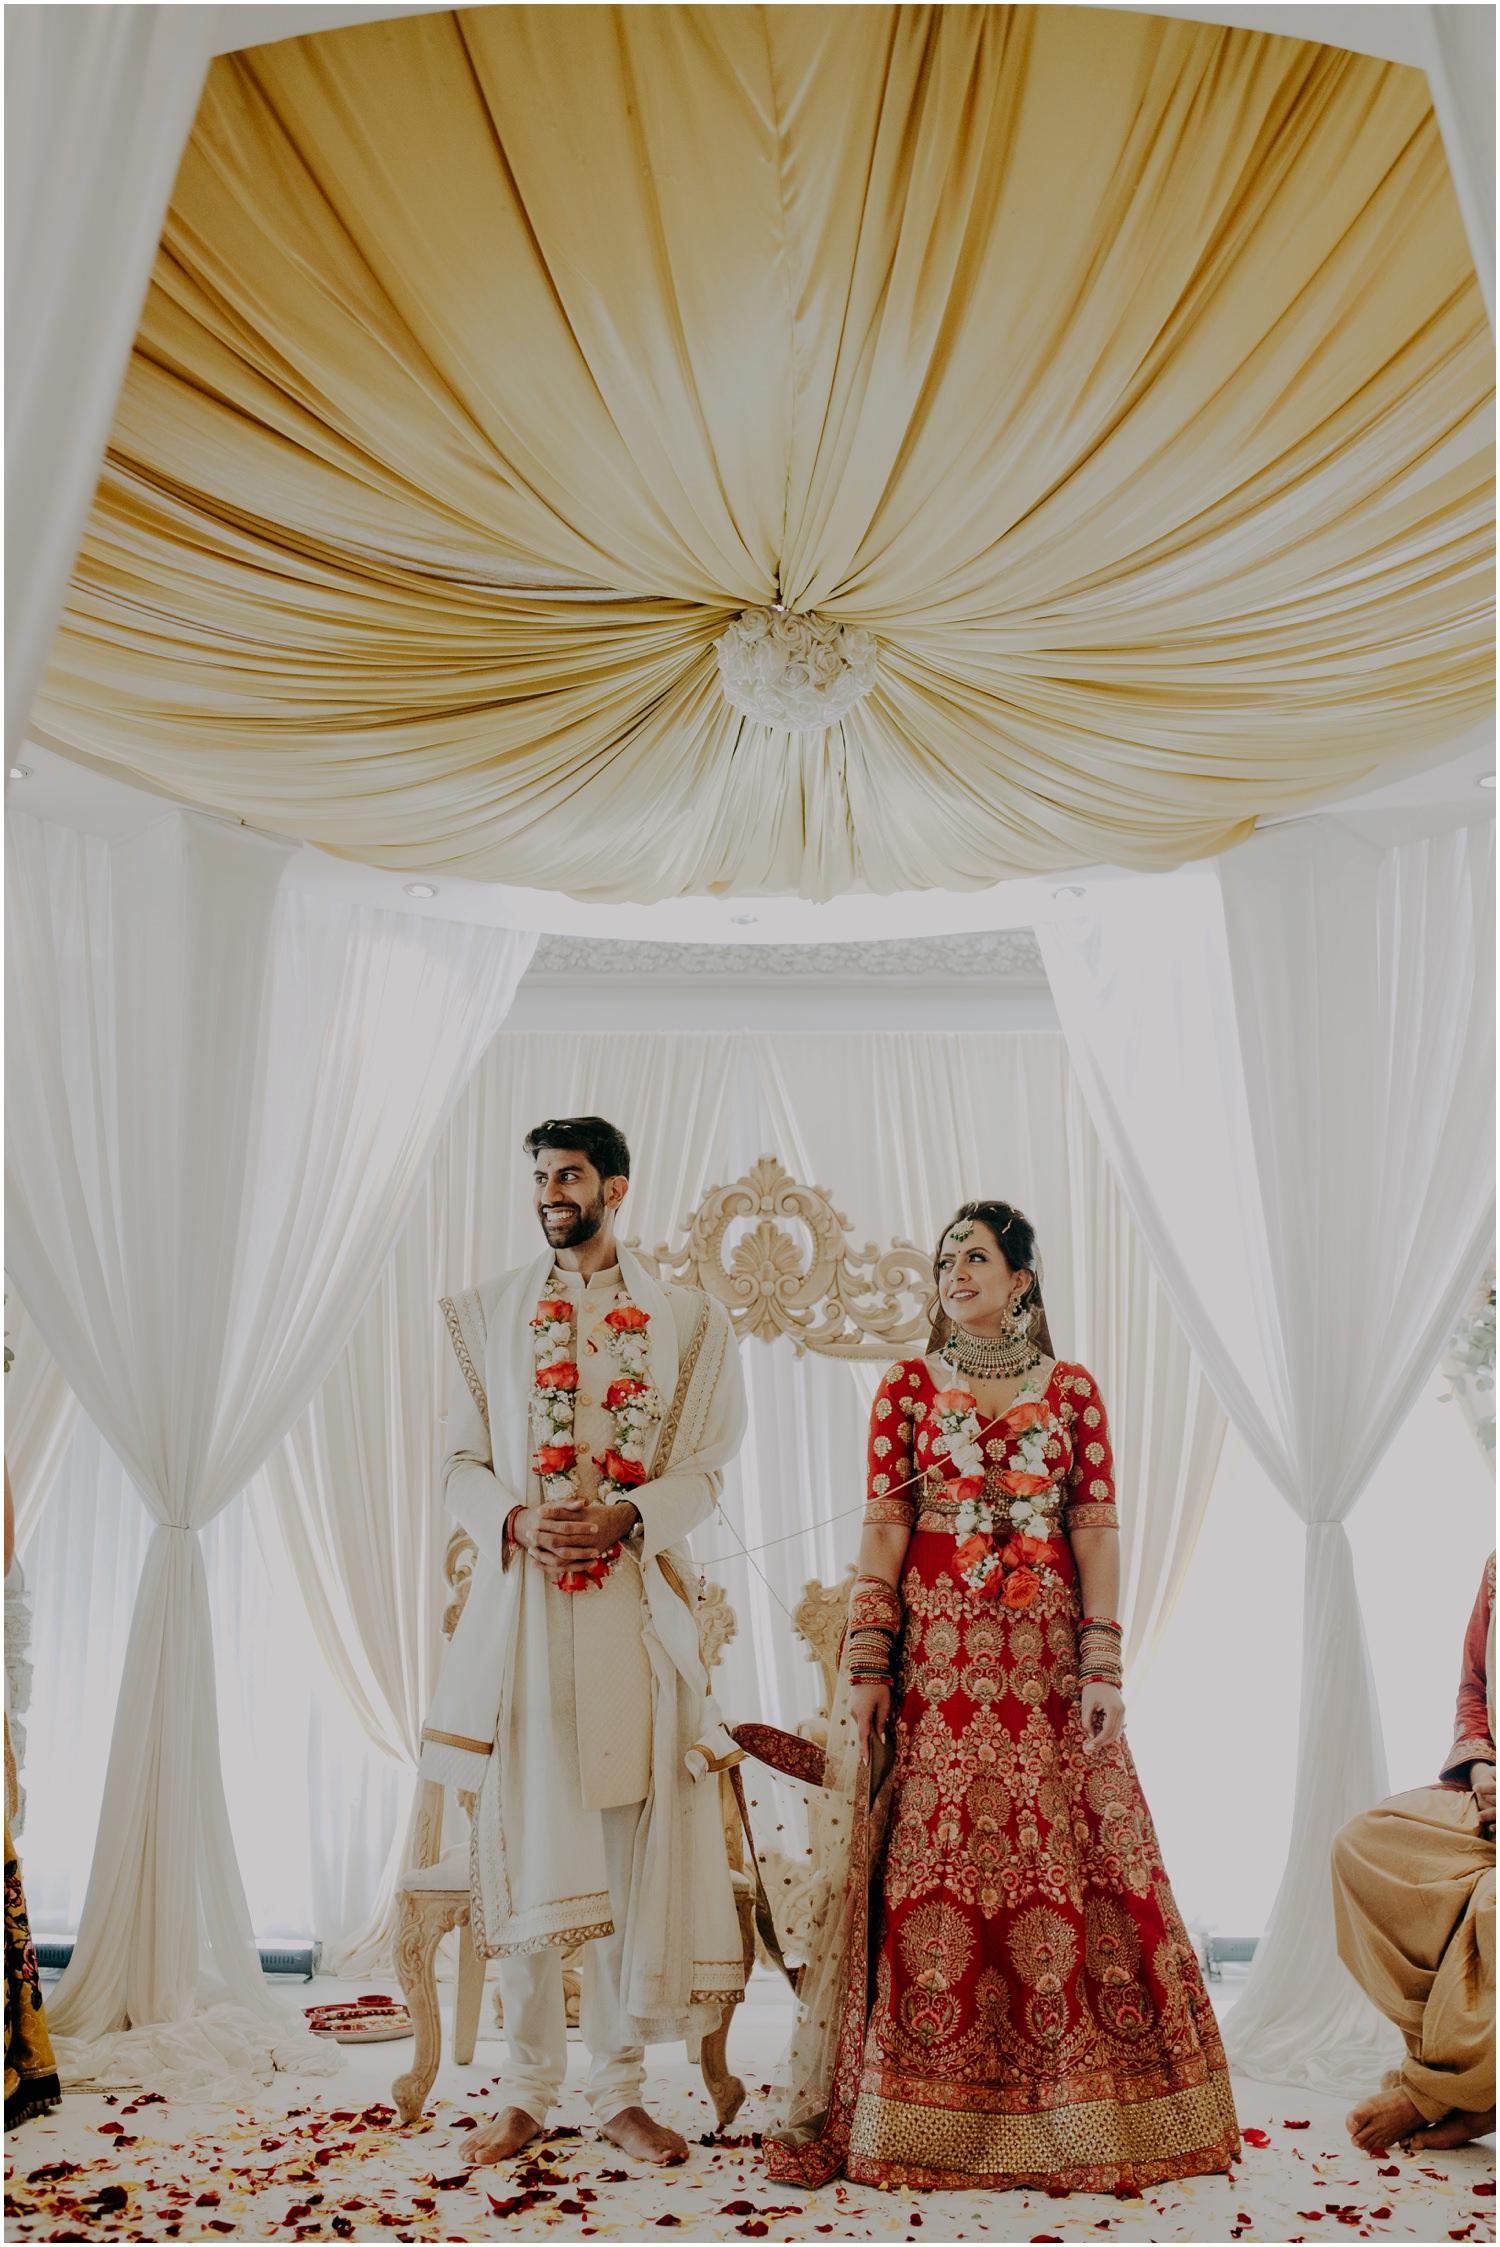 brighton alternative wedding photographer129.jpg